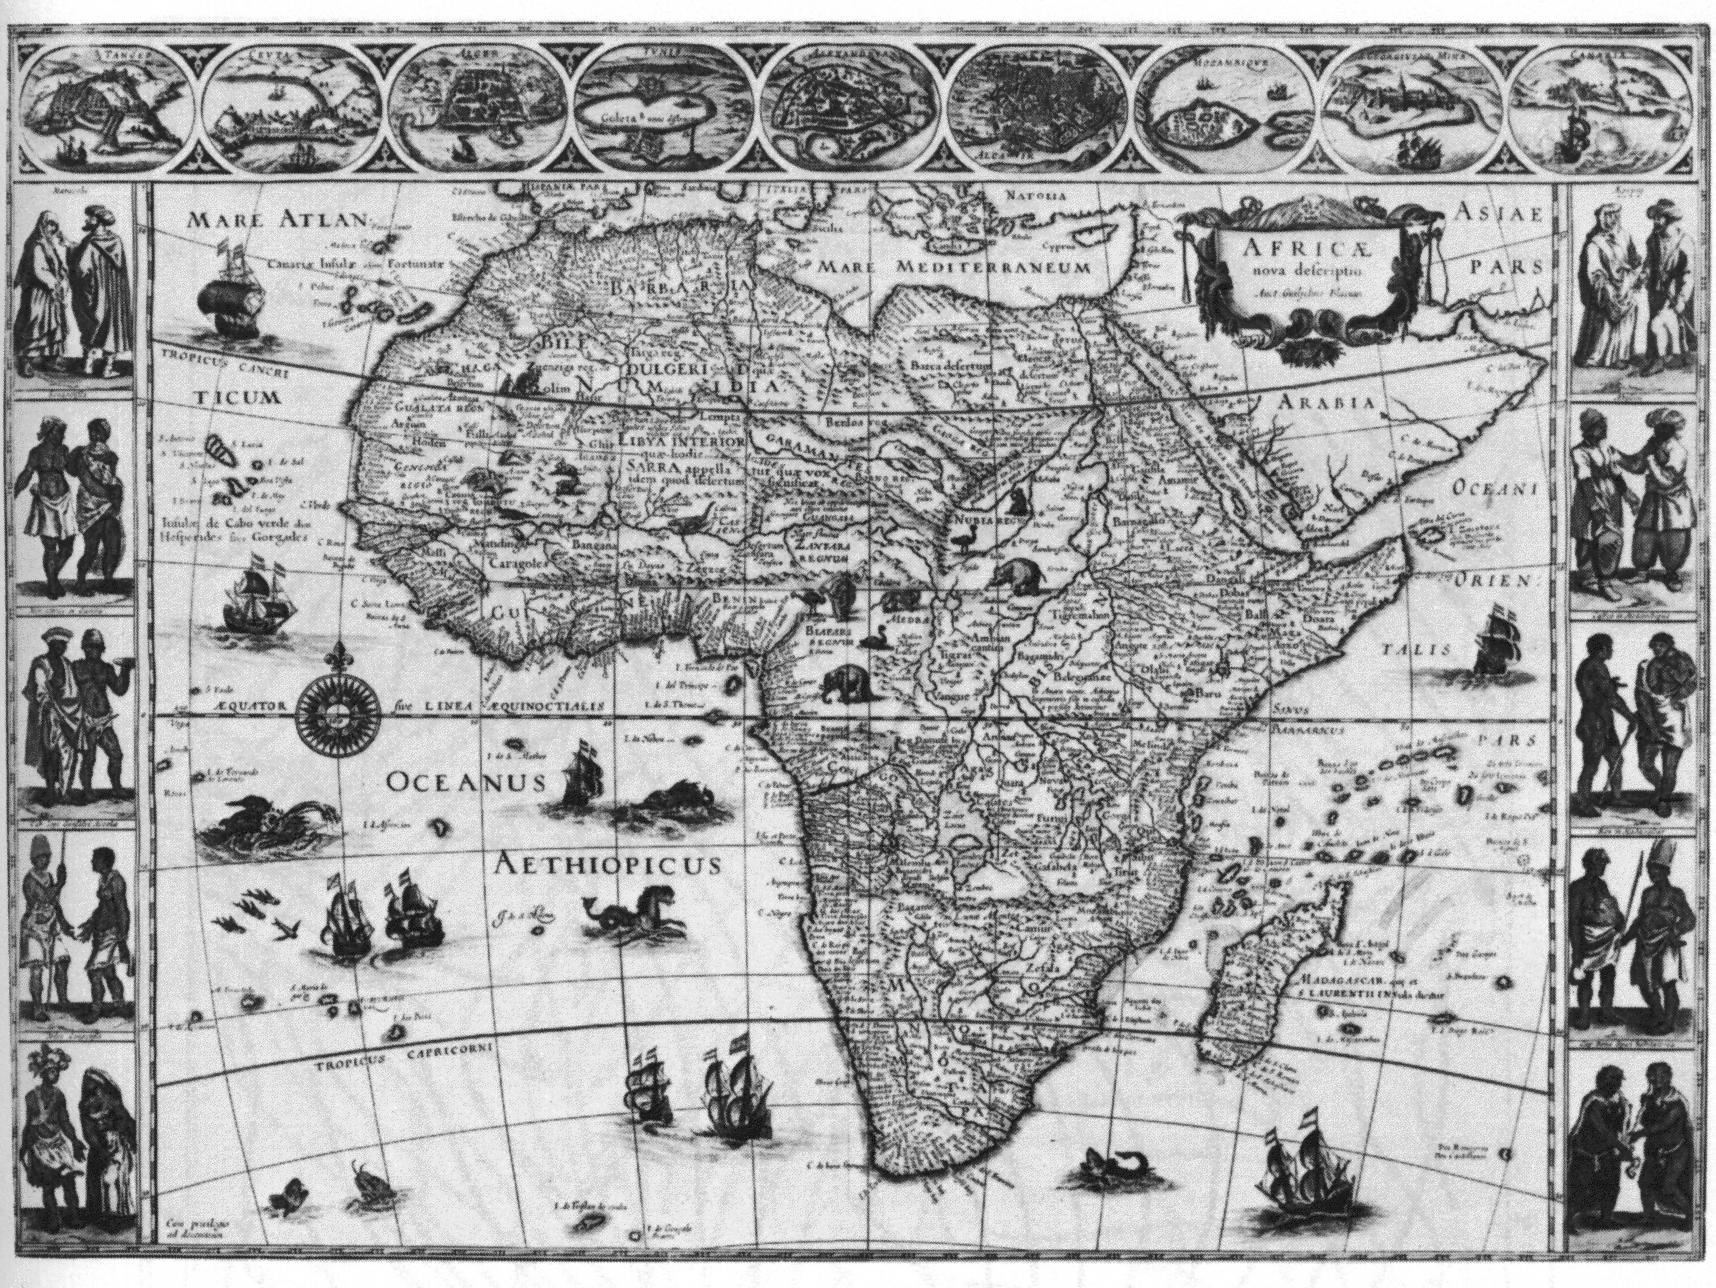 Africa in 1648